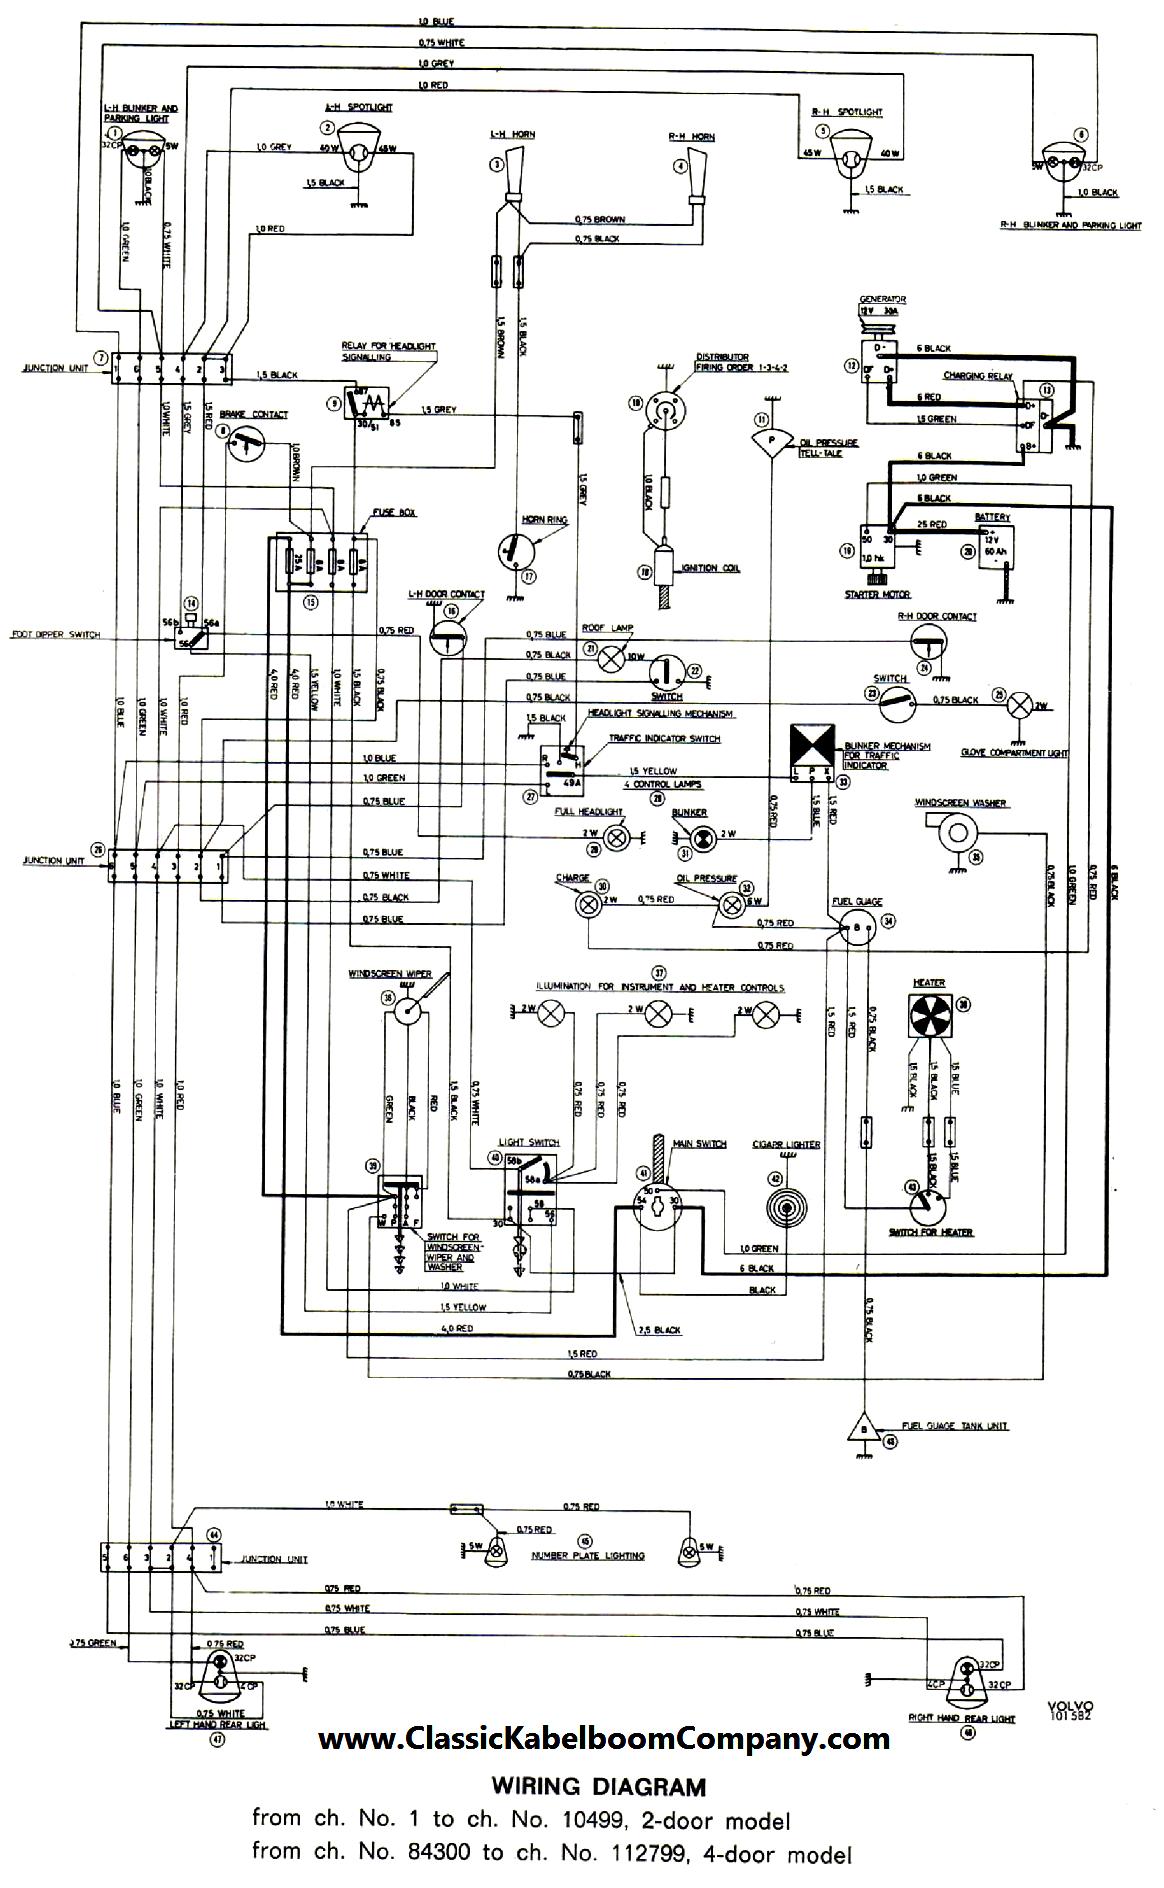 classic kabelboom company elektrisch bedrading schema volvo rh classickabelboomcompany com Volvo VNL Truck Wiring Diagrams Volvo Penta Wiring-Diagram